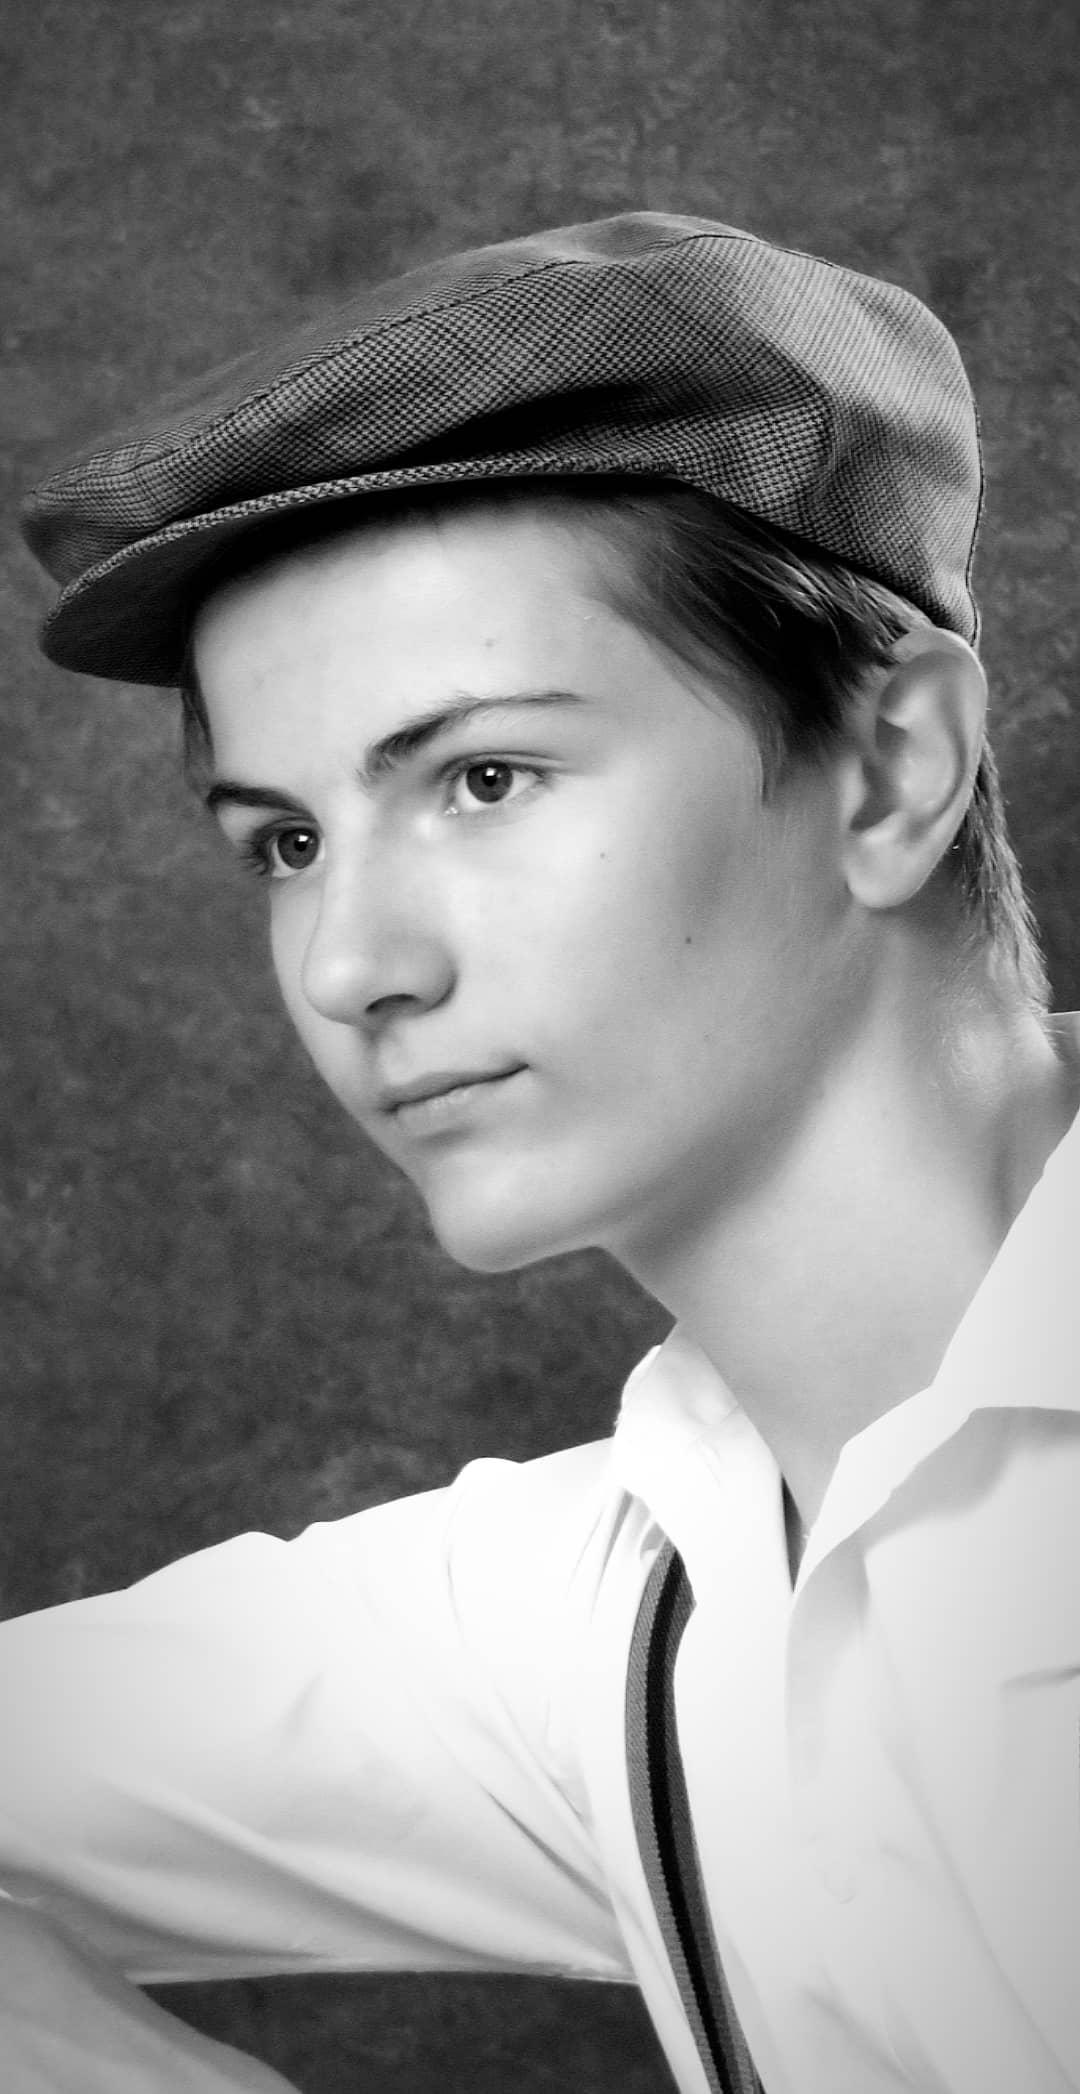 General photo of Anthony Ursin